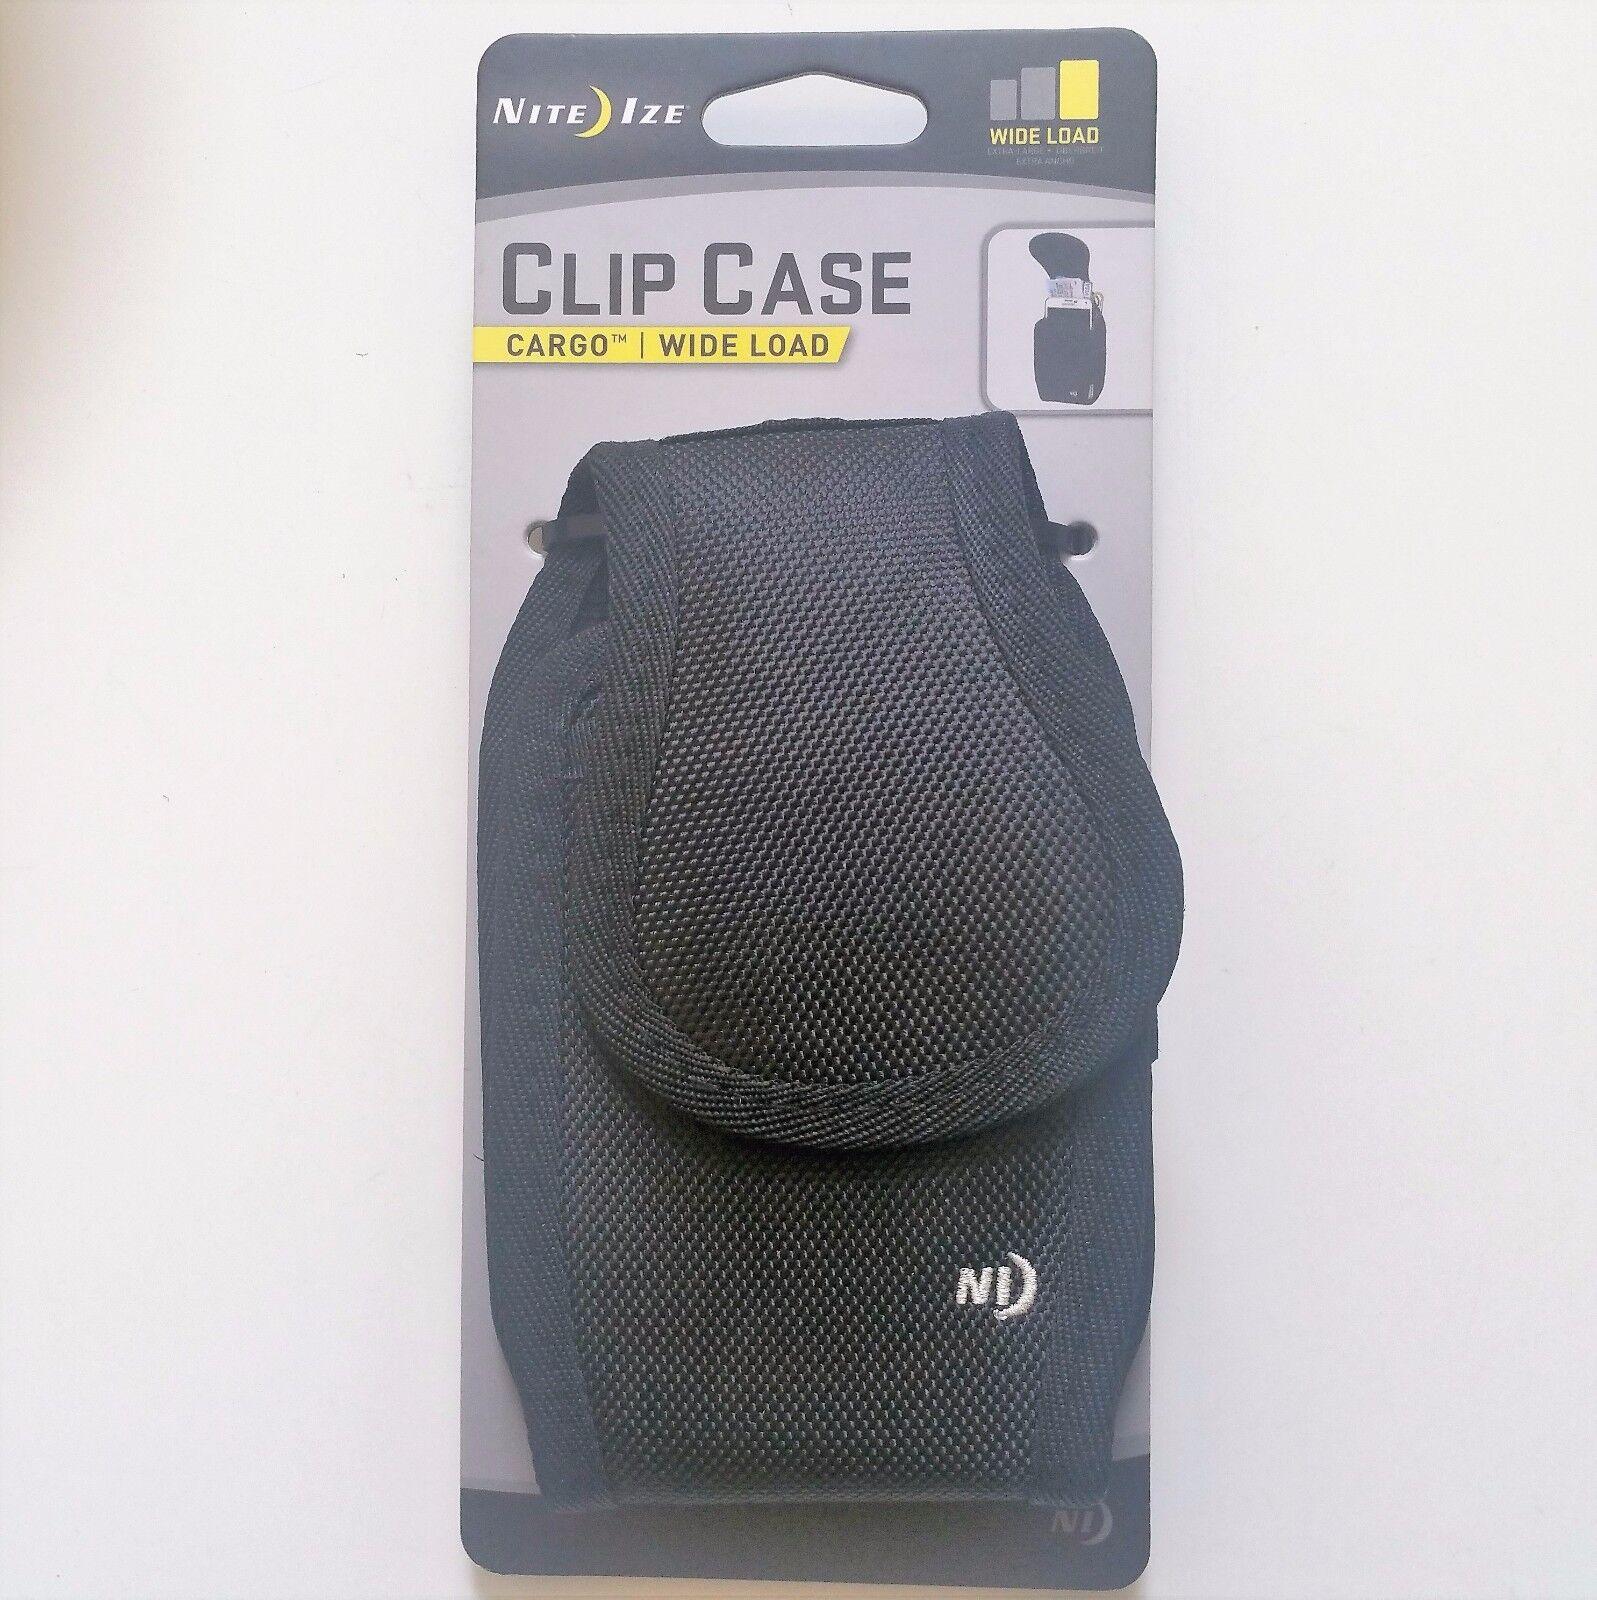 Nite Ize Clip Case Cargo Cell Phone Holder W' Holster Bel...